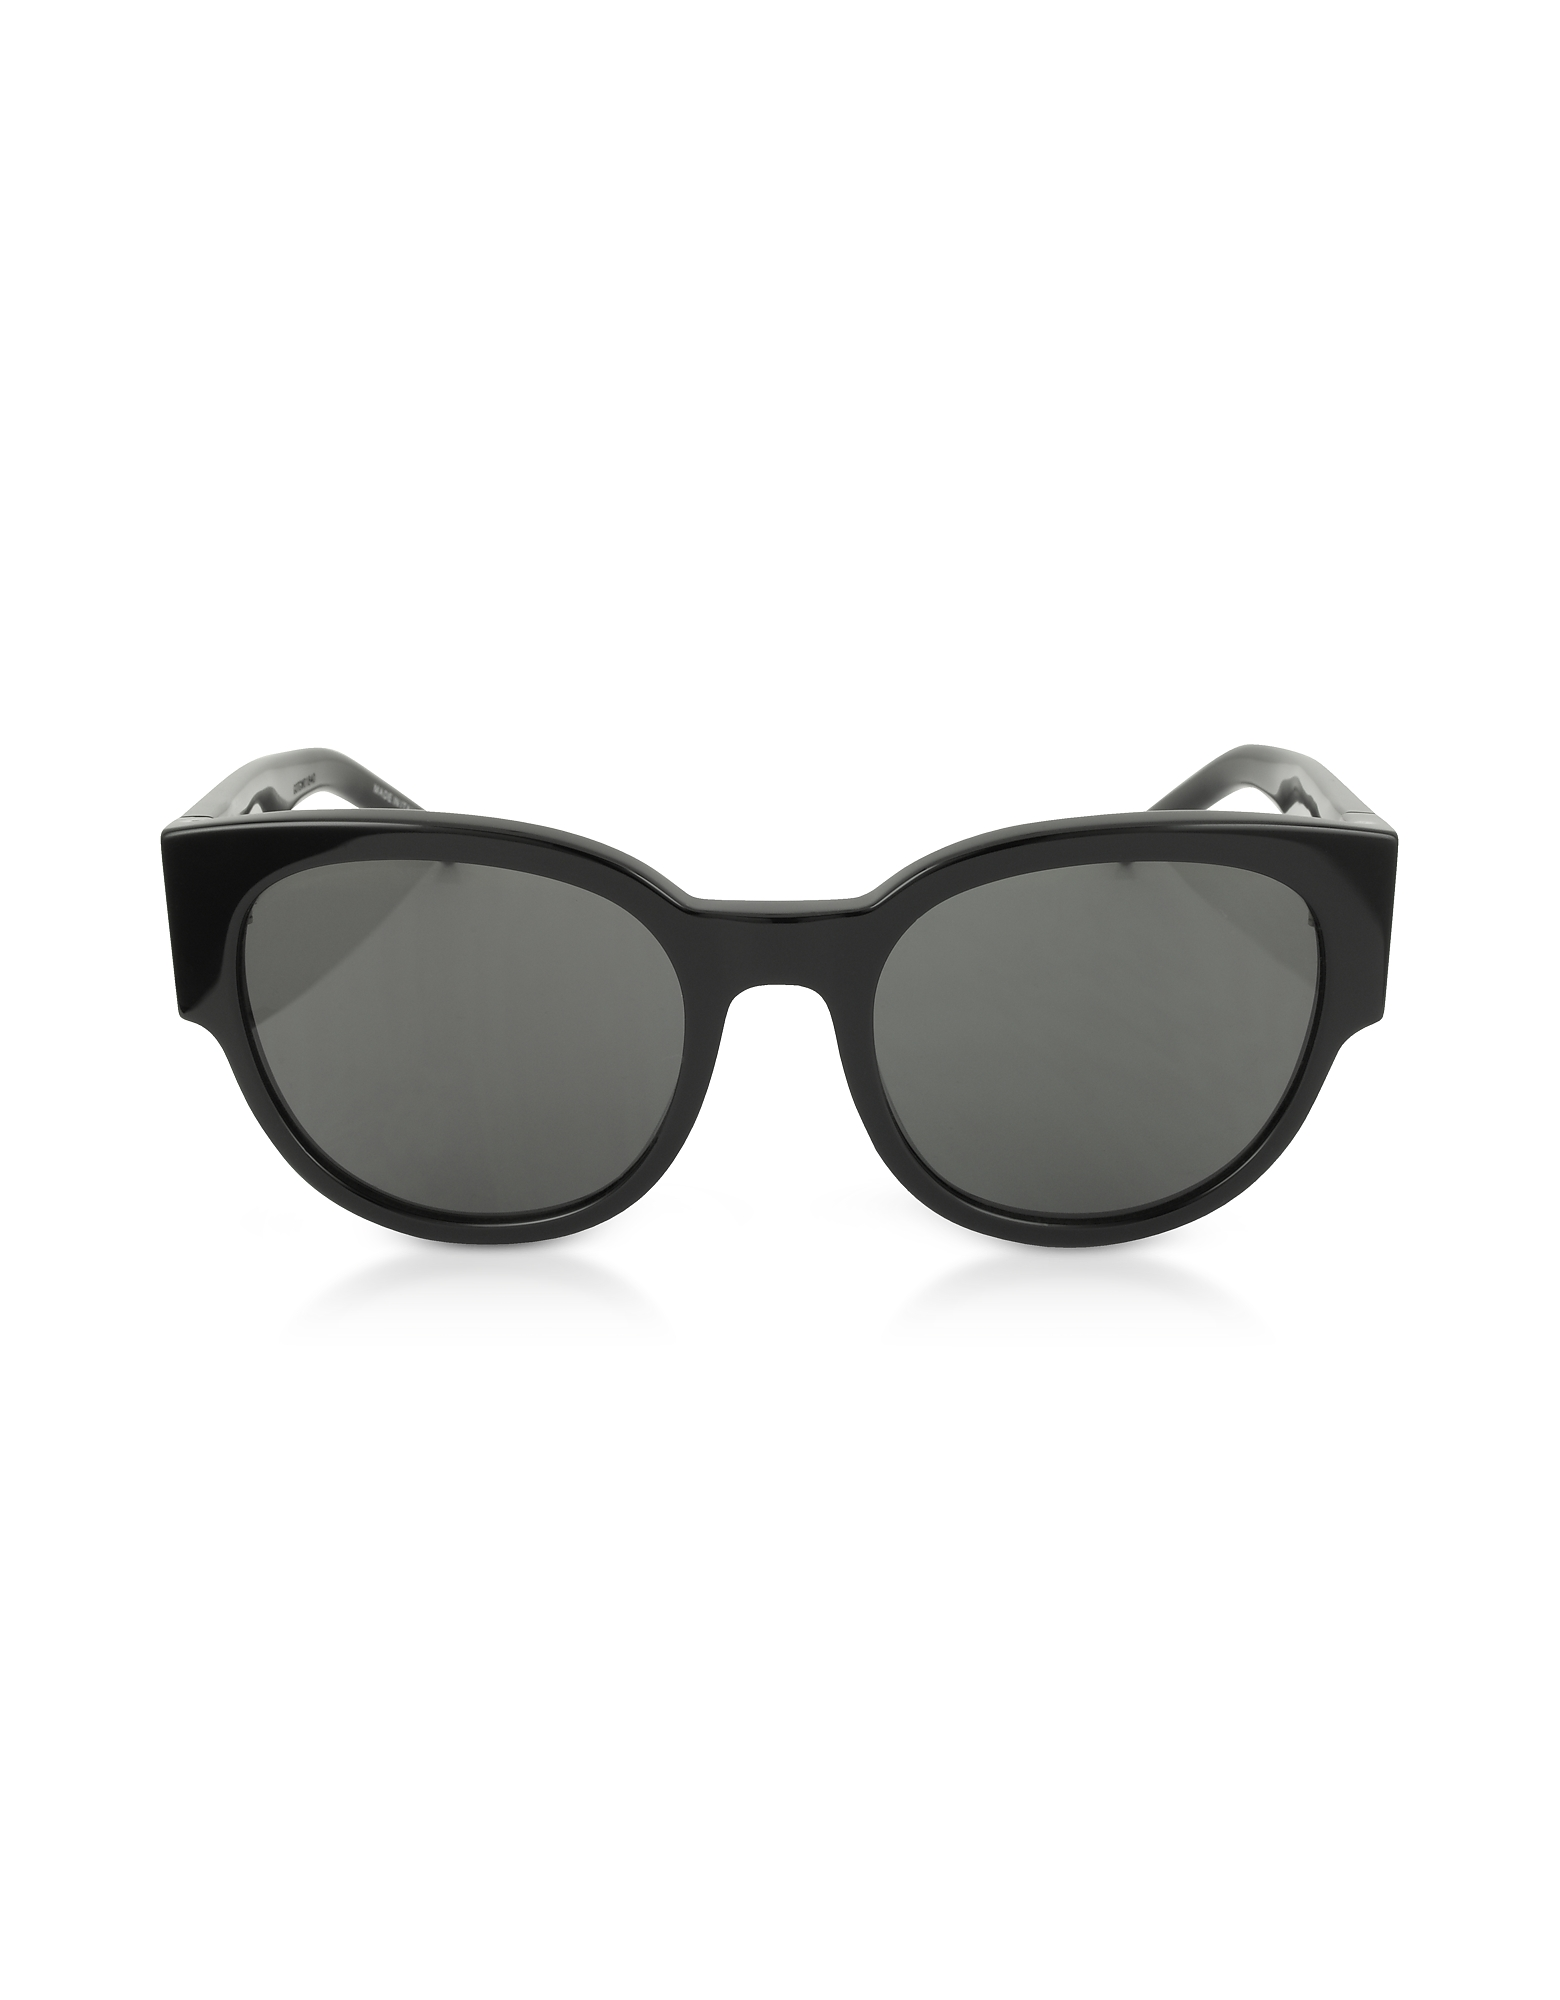 SL M19 Acetate Oval Frame Women's Sunglasses